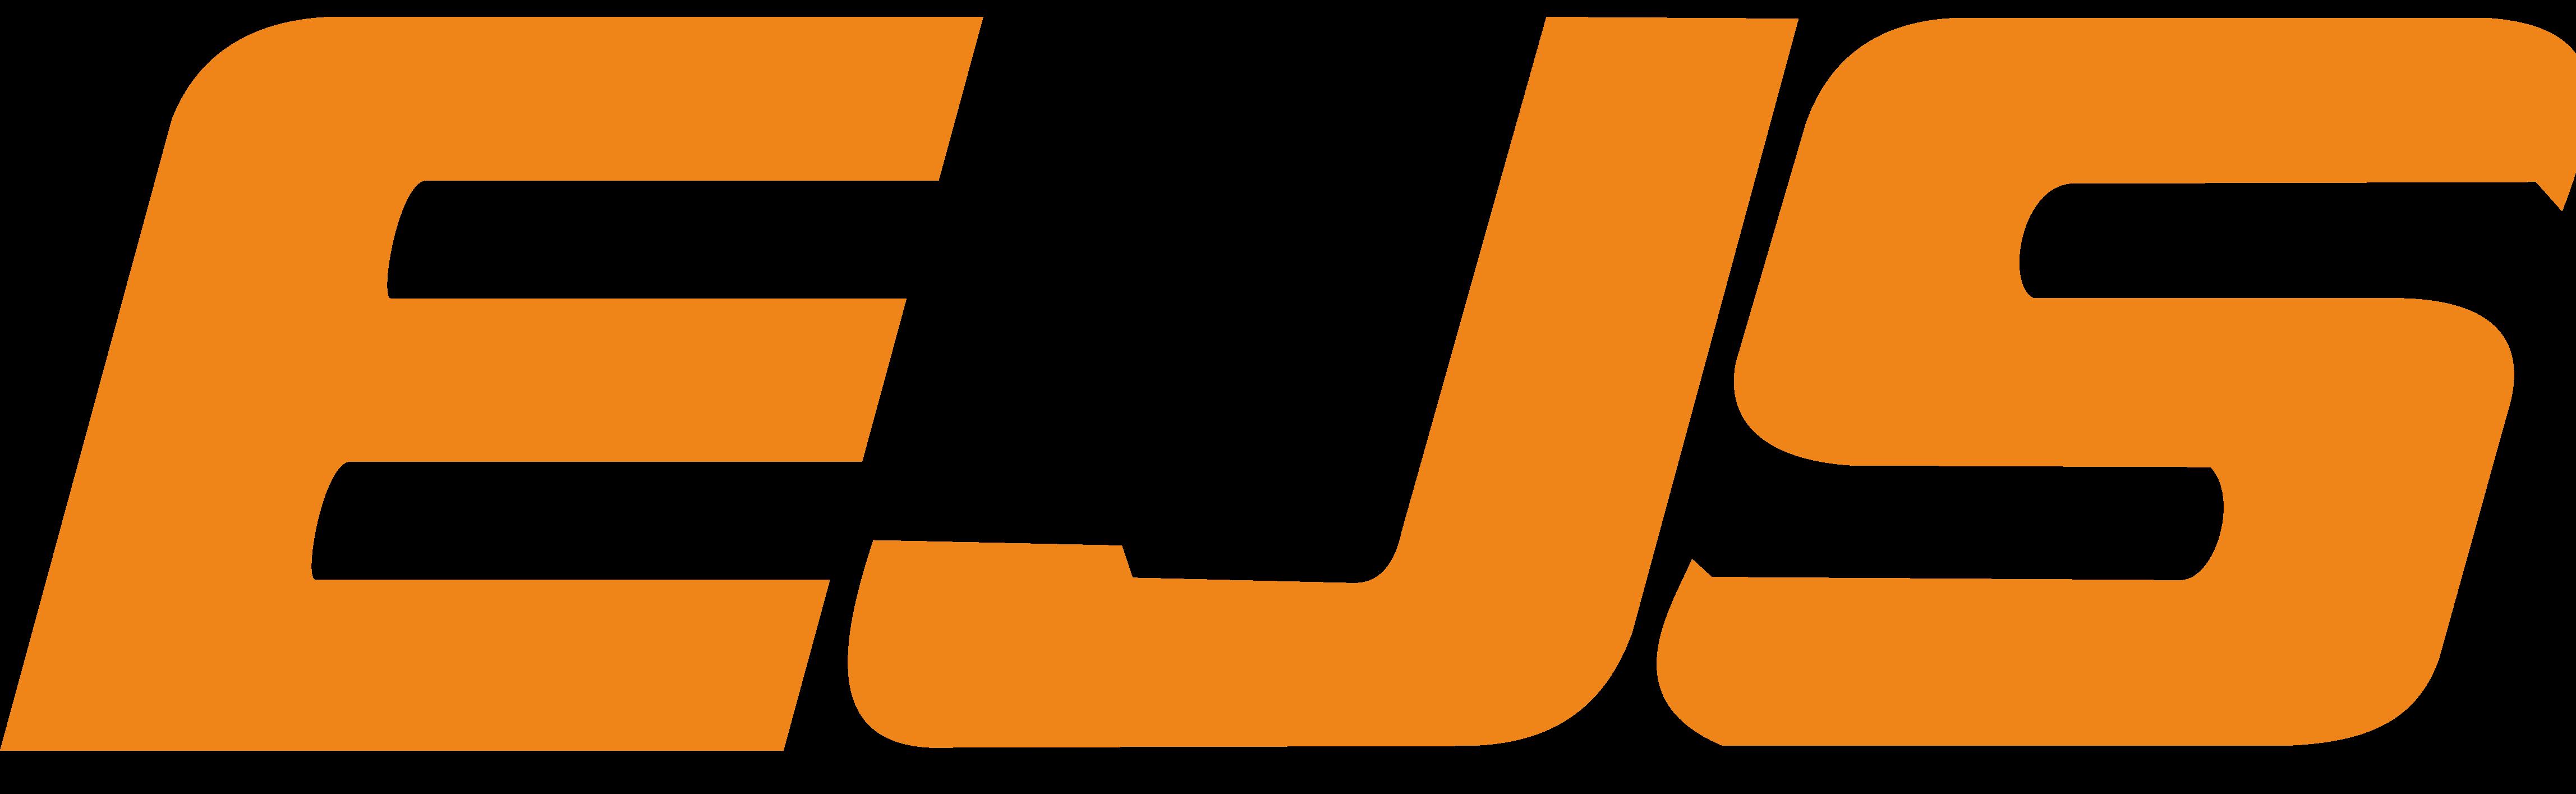 E.J.S INDUSTRY CO., LTD